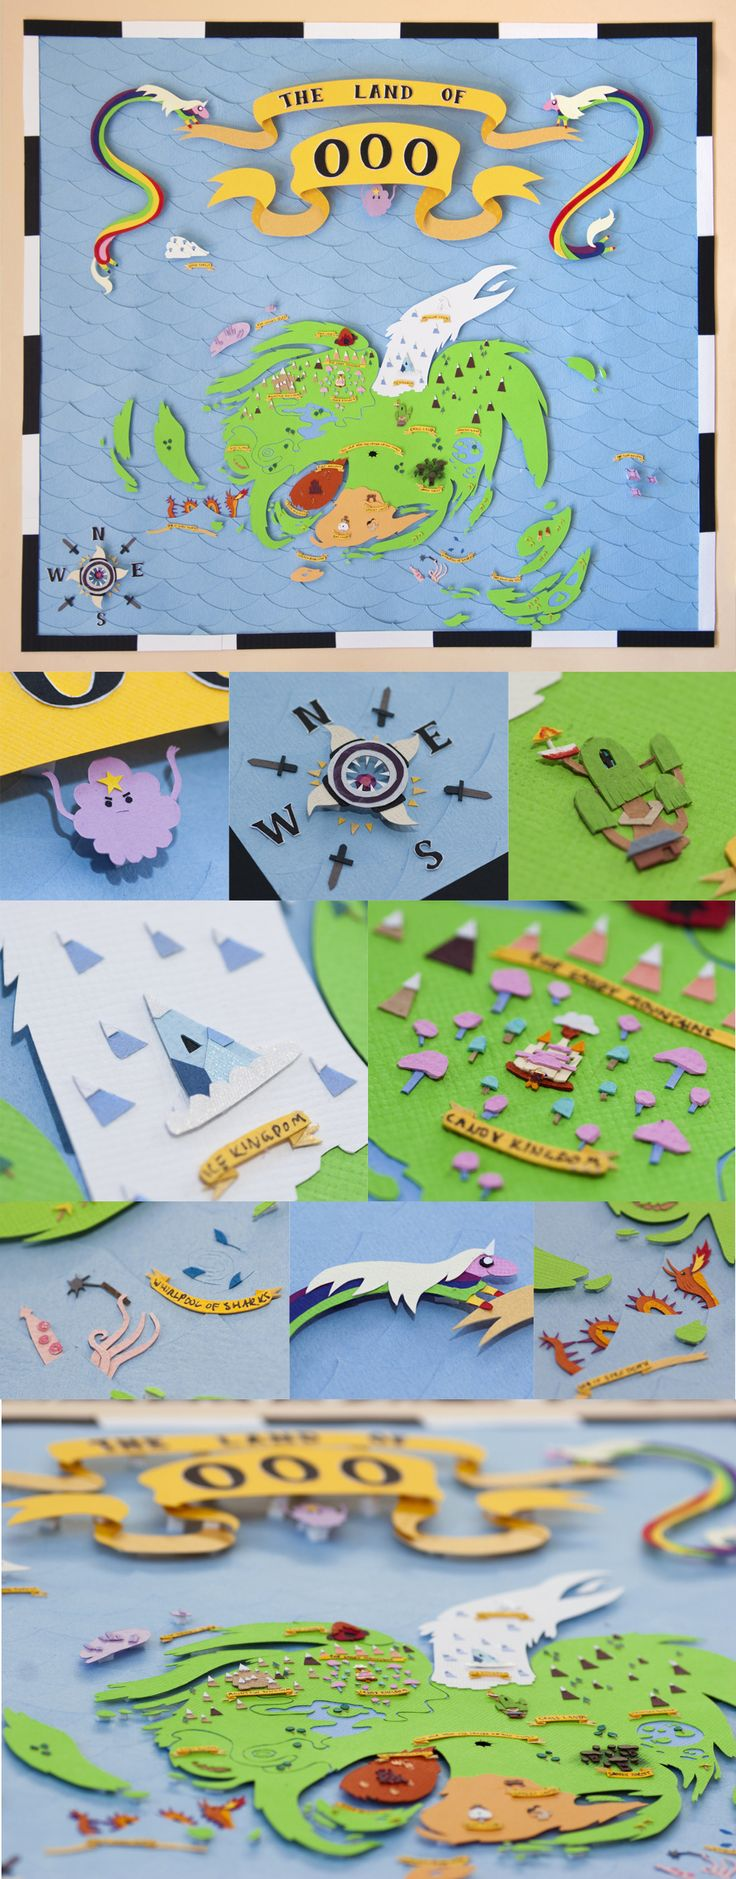 Adventure Time | Shmowzow! This is amazeballs ~ Map of Ooo by PlaidCushion.deviantart.com on @deviantART